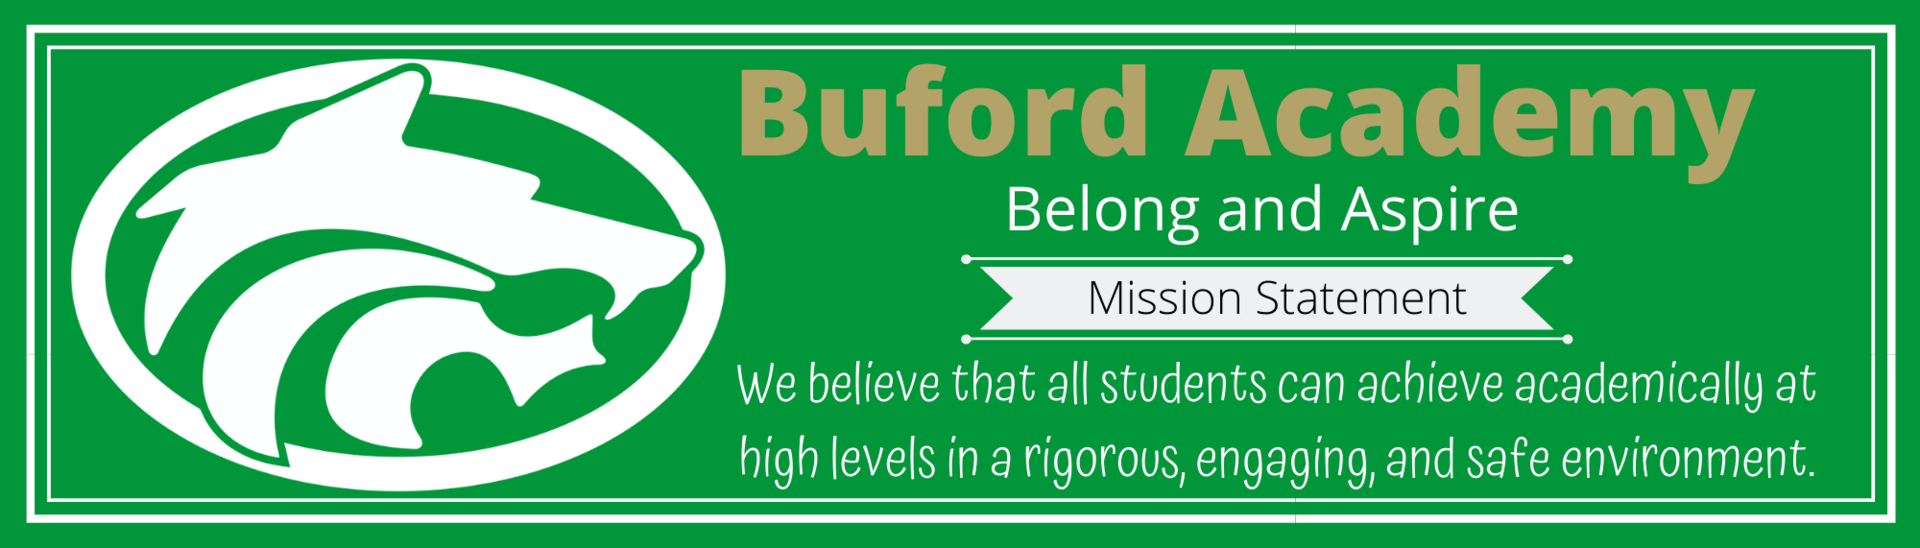 BA Mission Statement